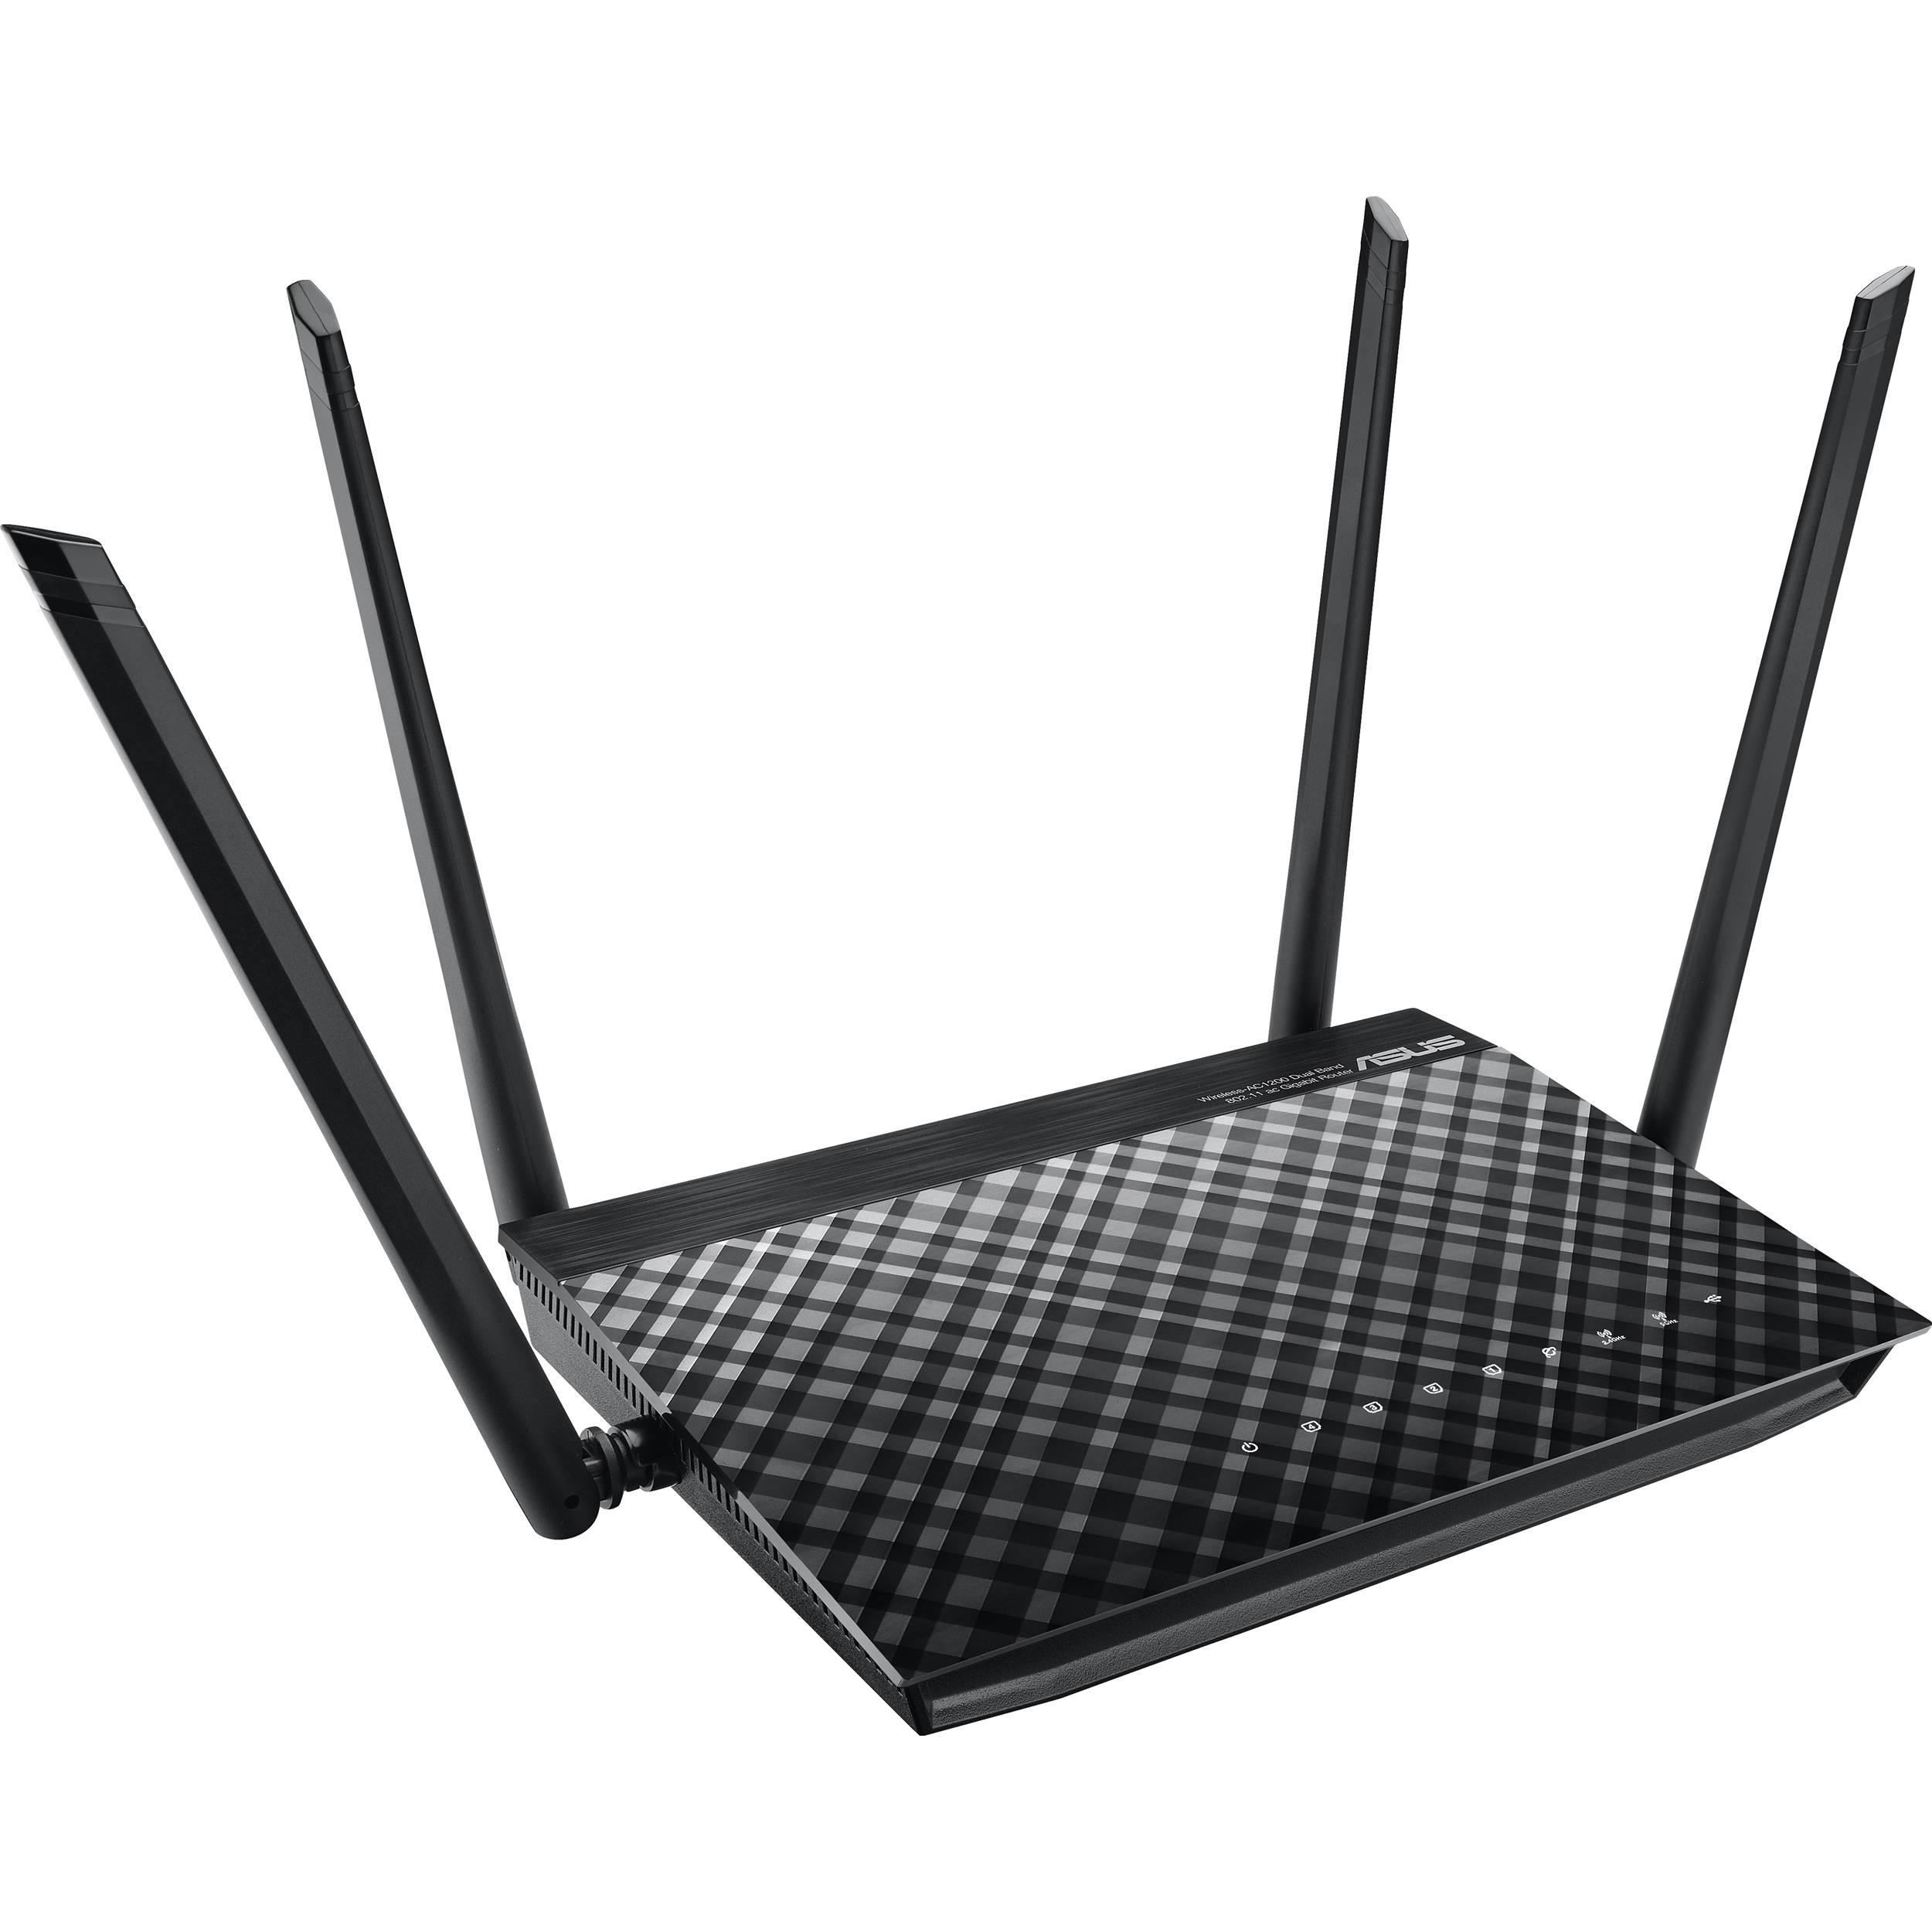 Asus Rt Ac1200g Ac1200 Wireless Dual Band Gigabit Rt Ac1200g B H